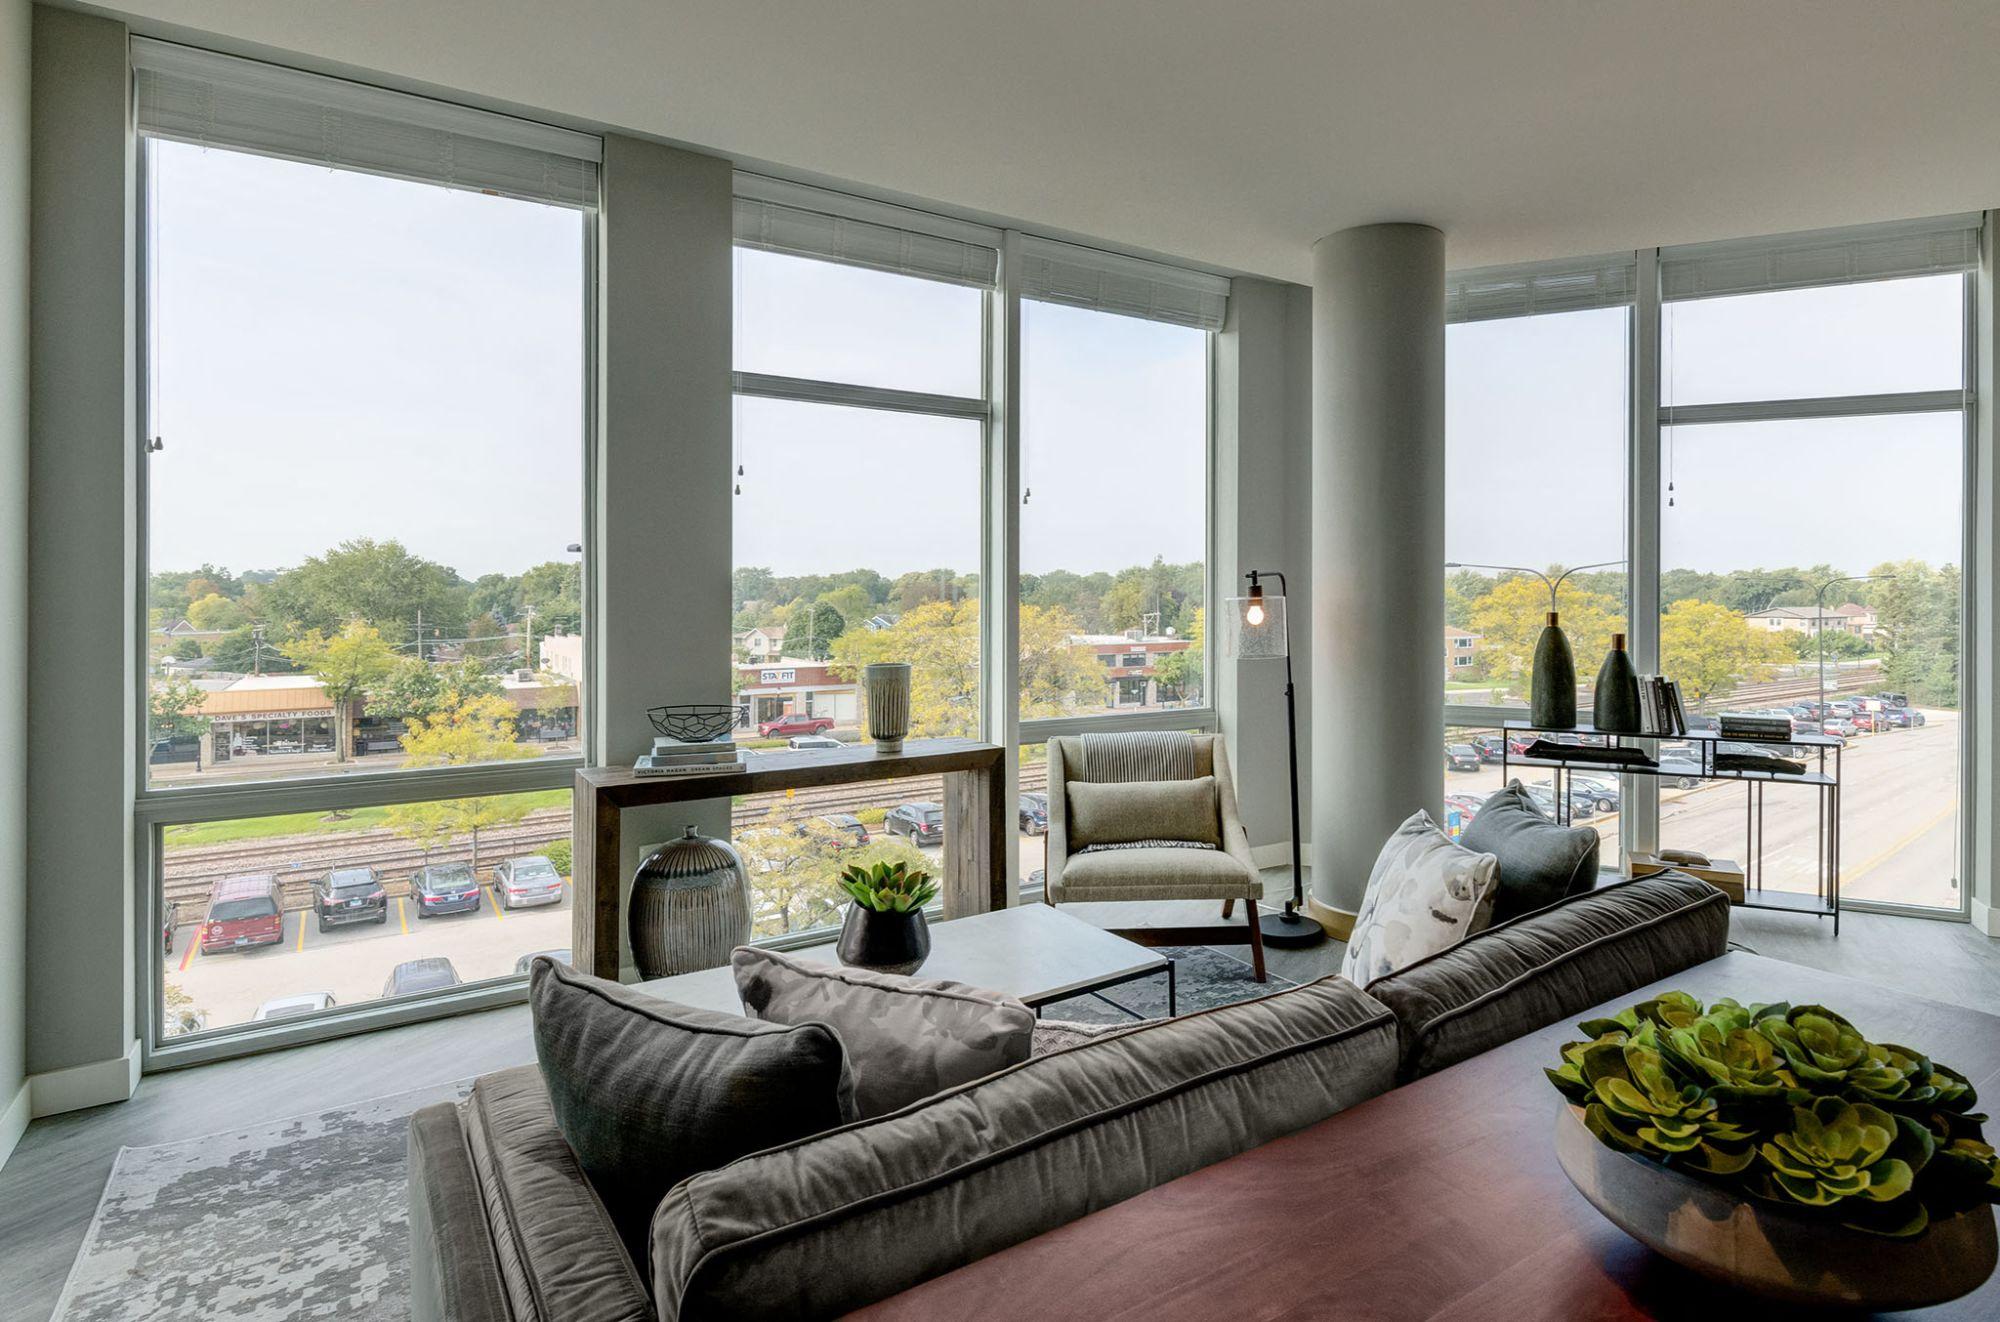 Living room overlooking large windows